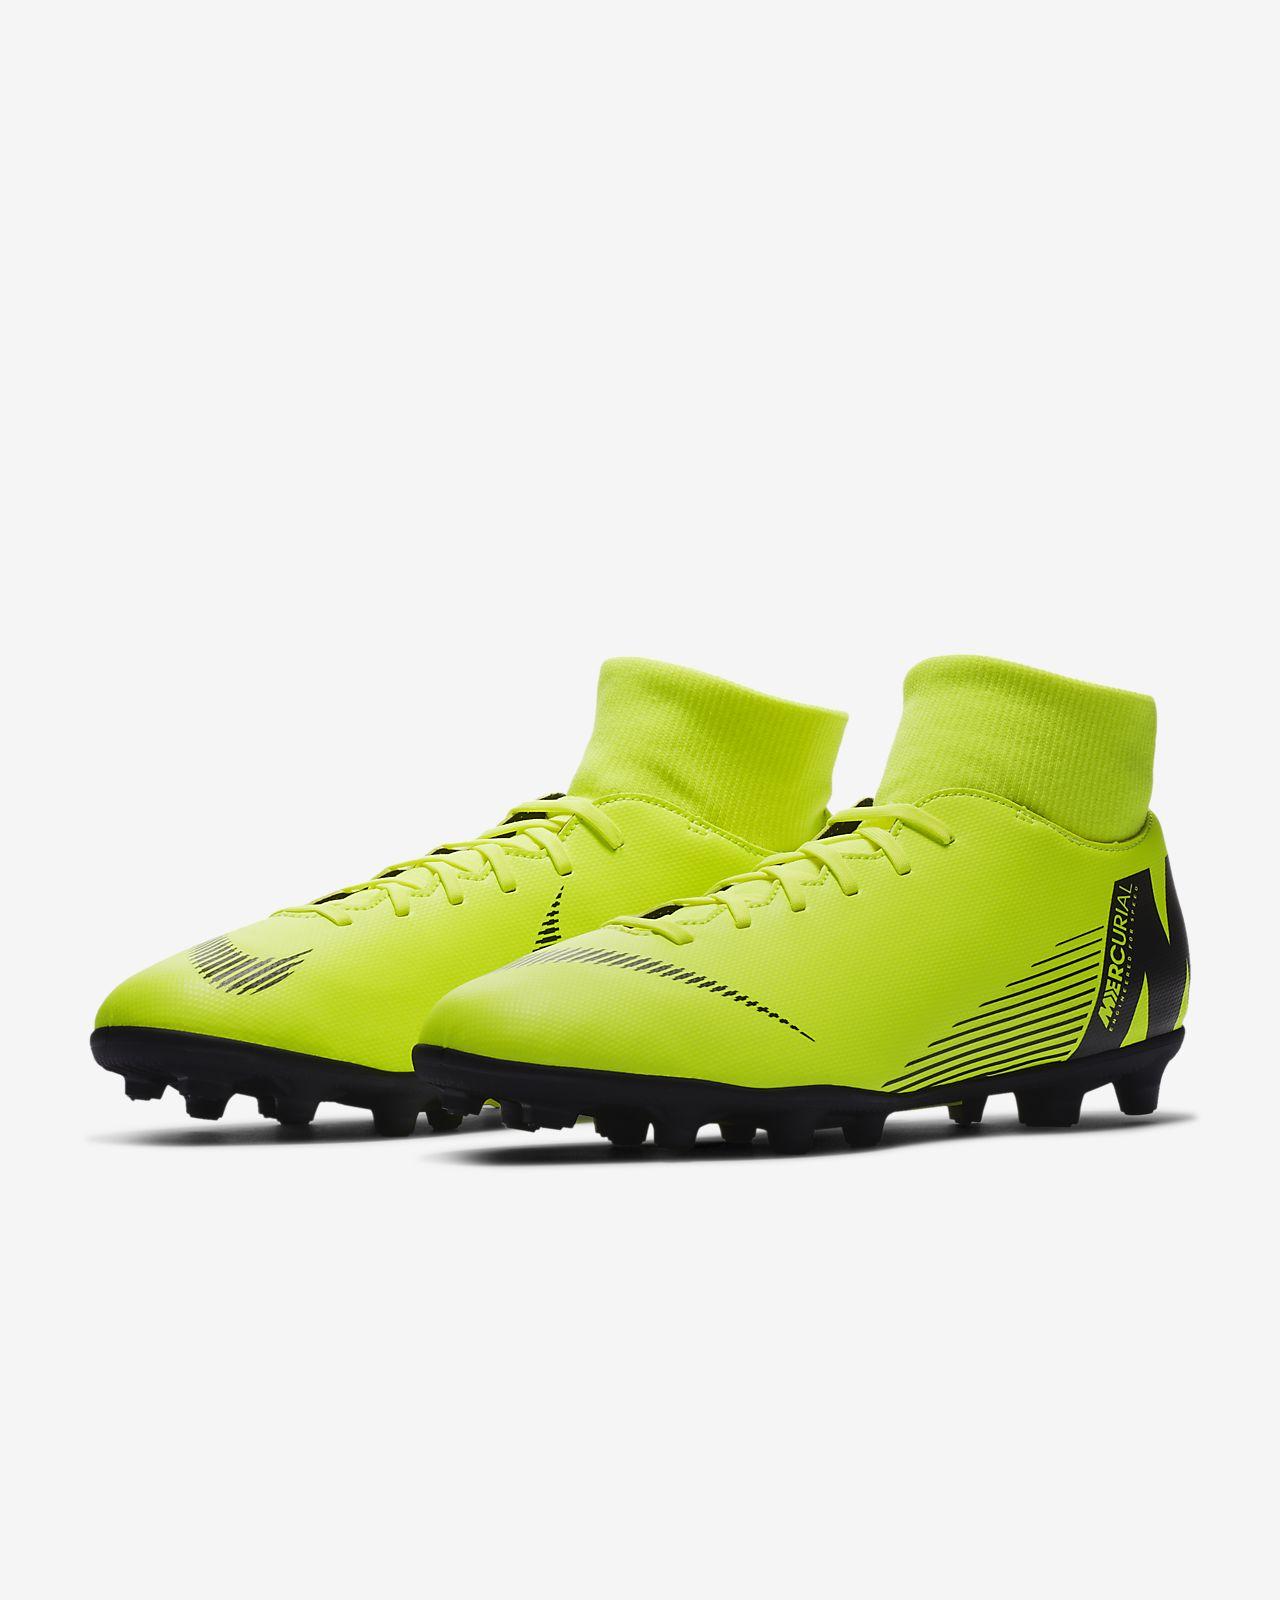 ... Nike Mercurial Superfly VI Club Botas de fútbol para múltiples  superficies 448ca143b42a4